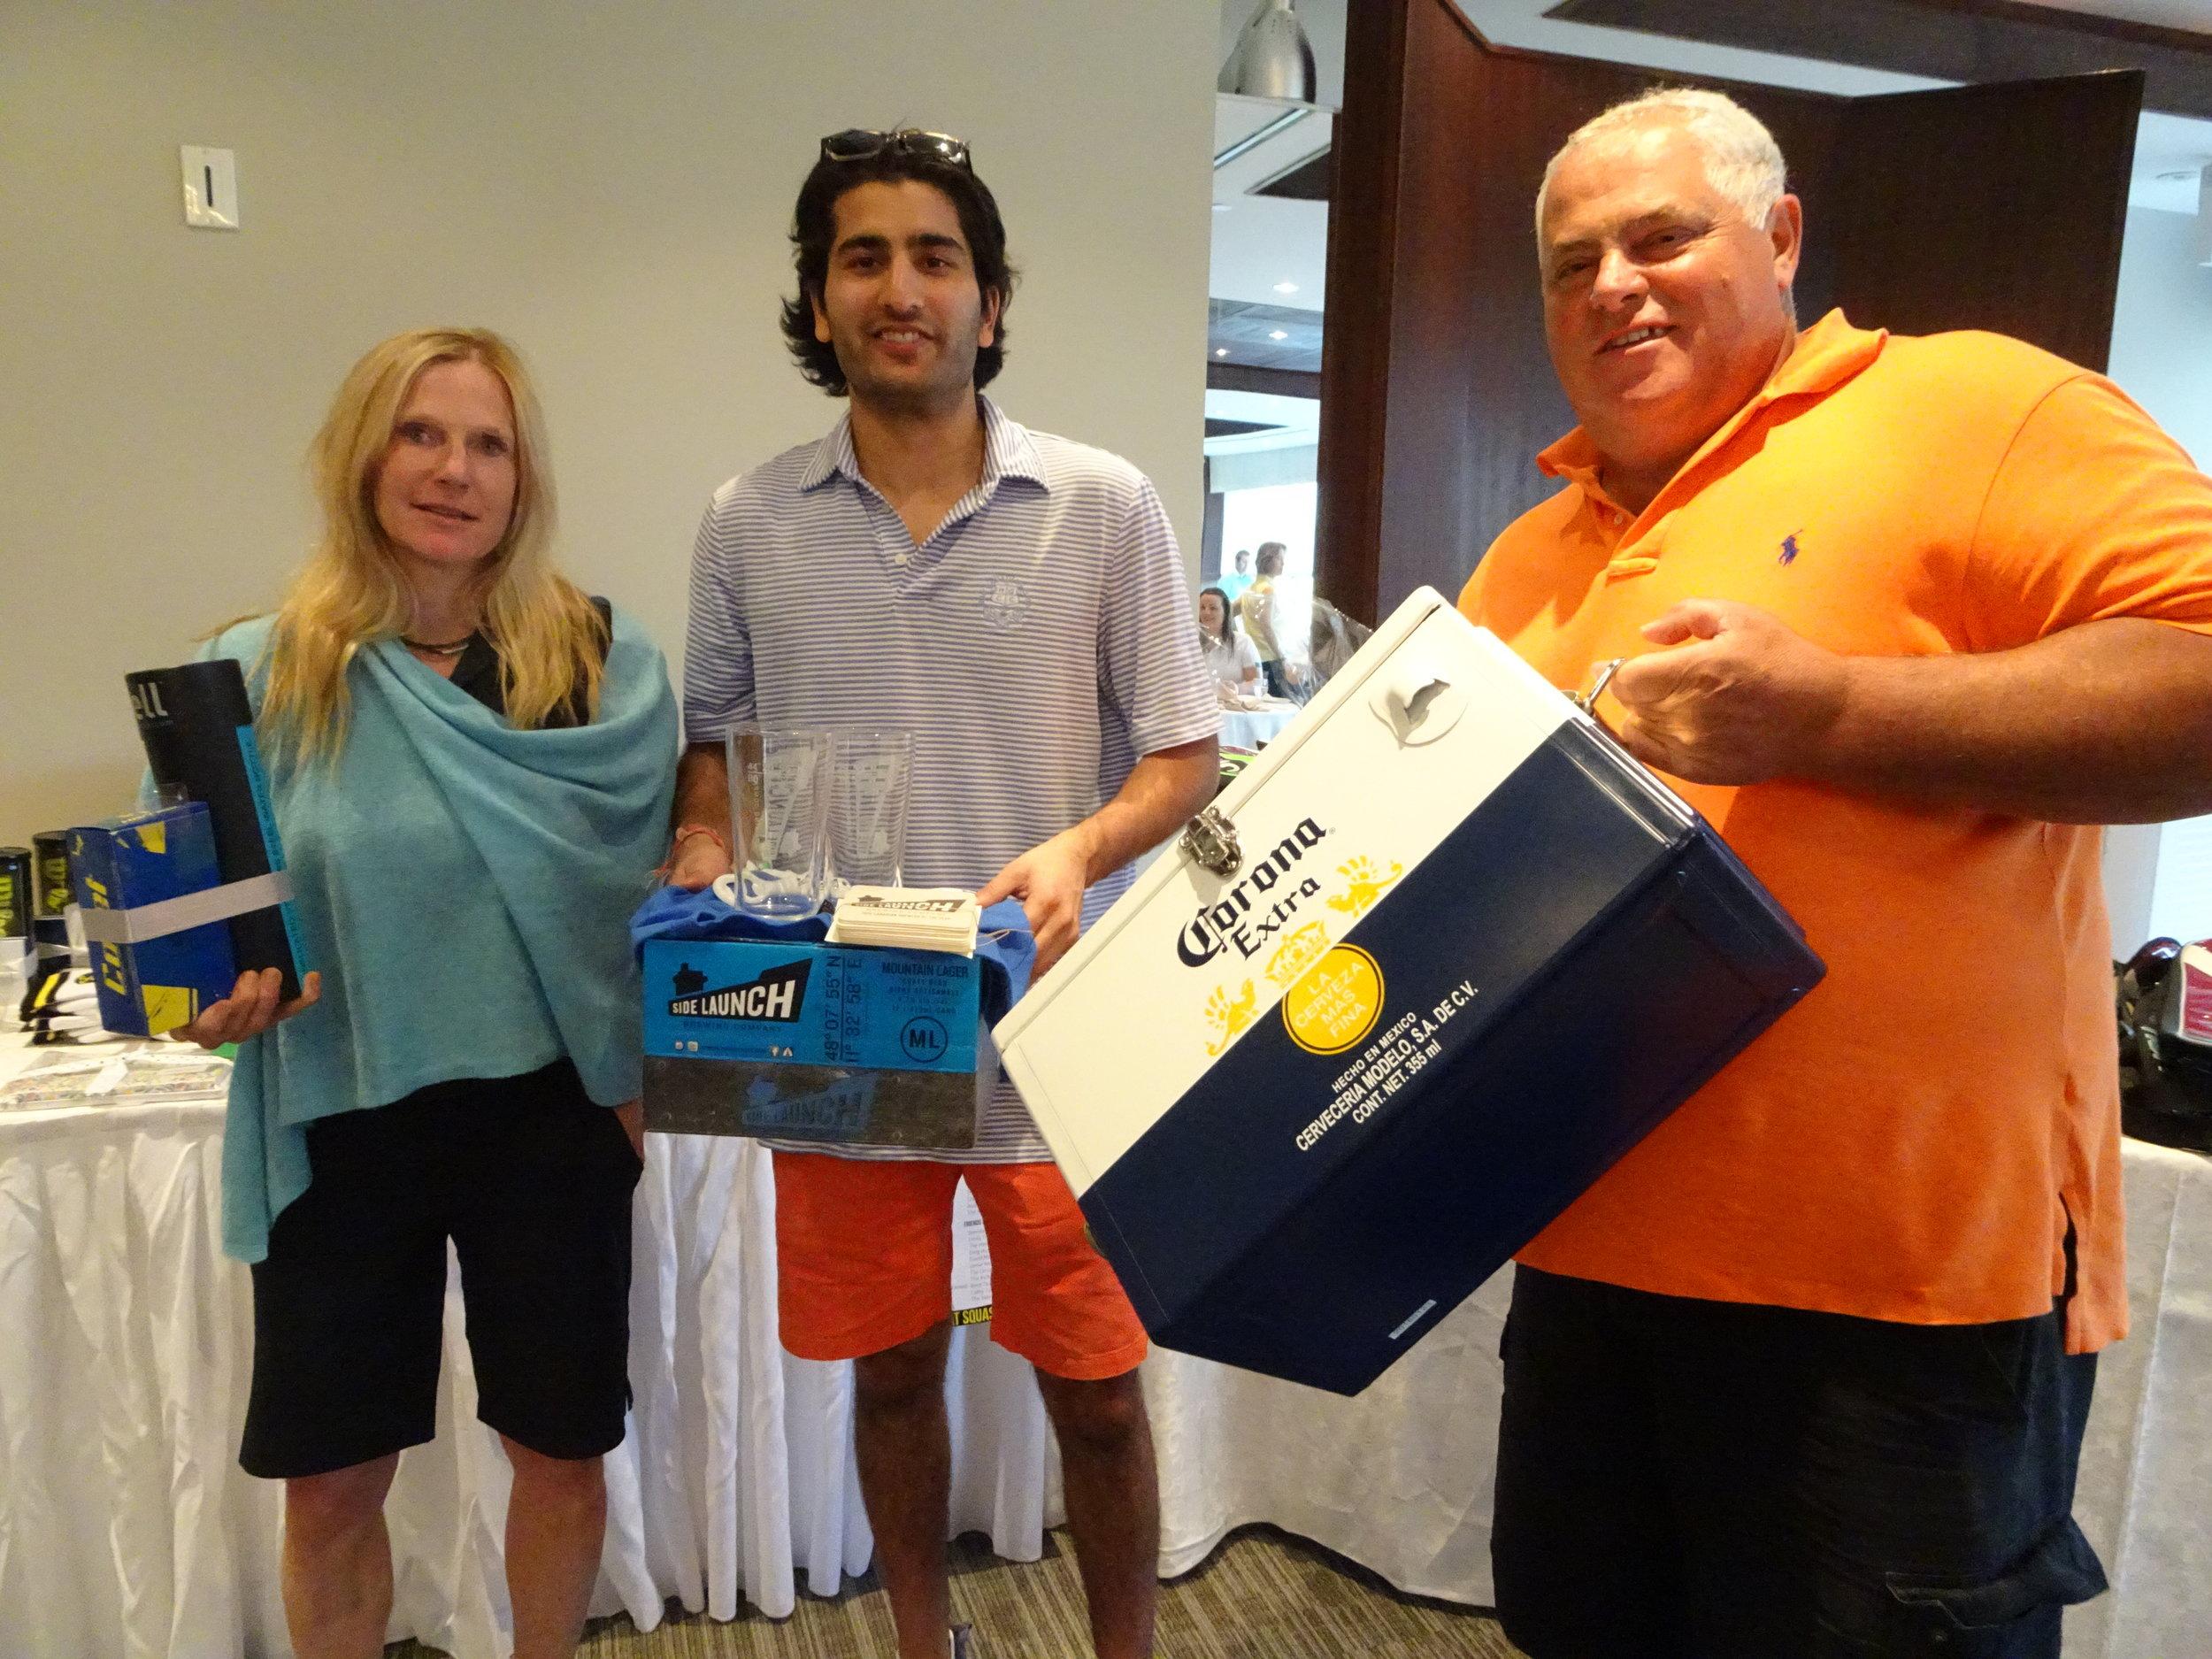 Contest Hole Winners: Robbin Wheeler (women's longest drive), Arjun Gupta (men's longest drive), Danny Paolucci (closest to the pin).